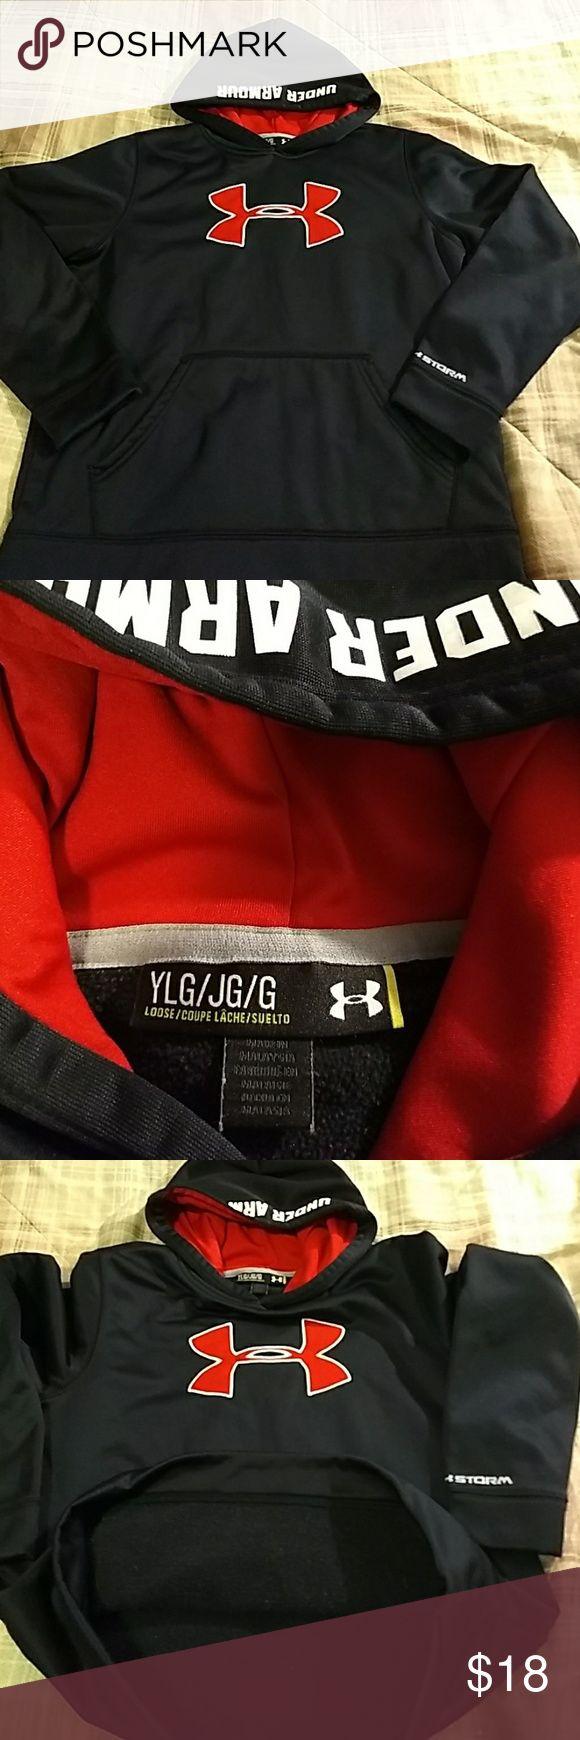 Under Armour youth lg hoodie fleece inside Under Armour youth lg hoodie fleece inside Under Armour Shirts & Tops Sweatshirts & Hoodies